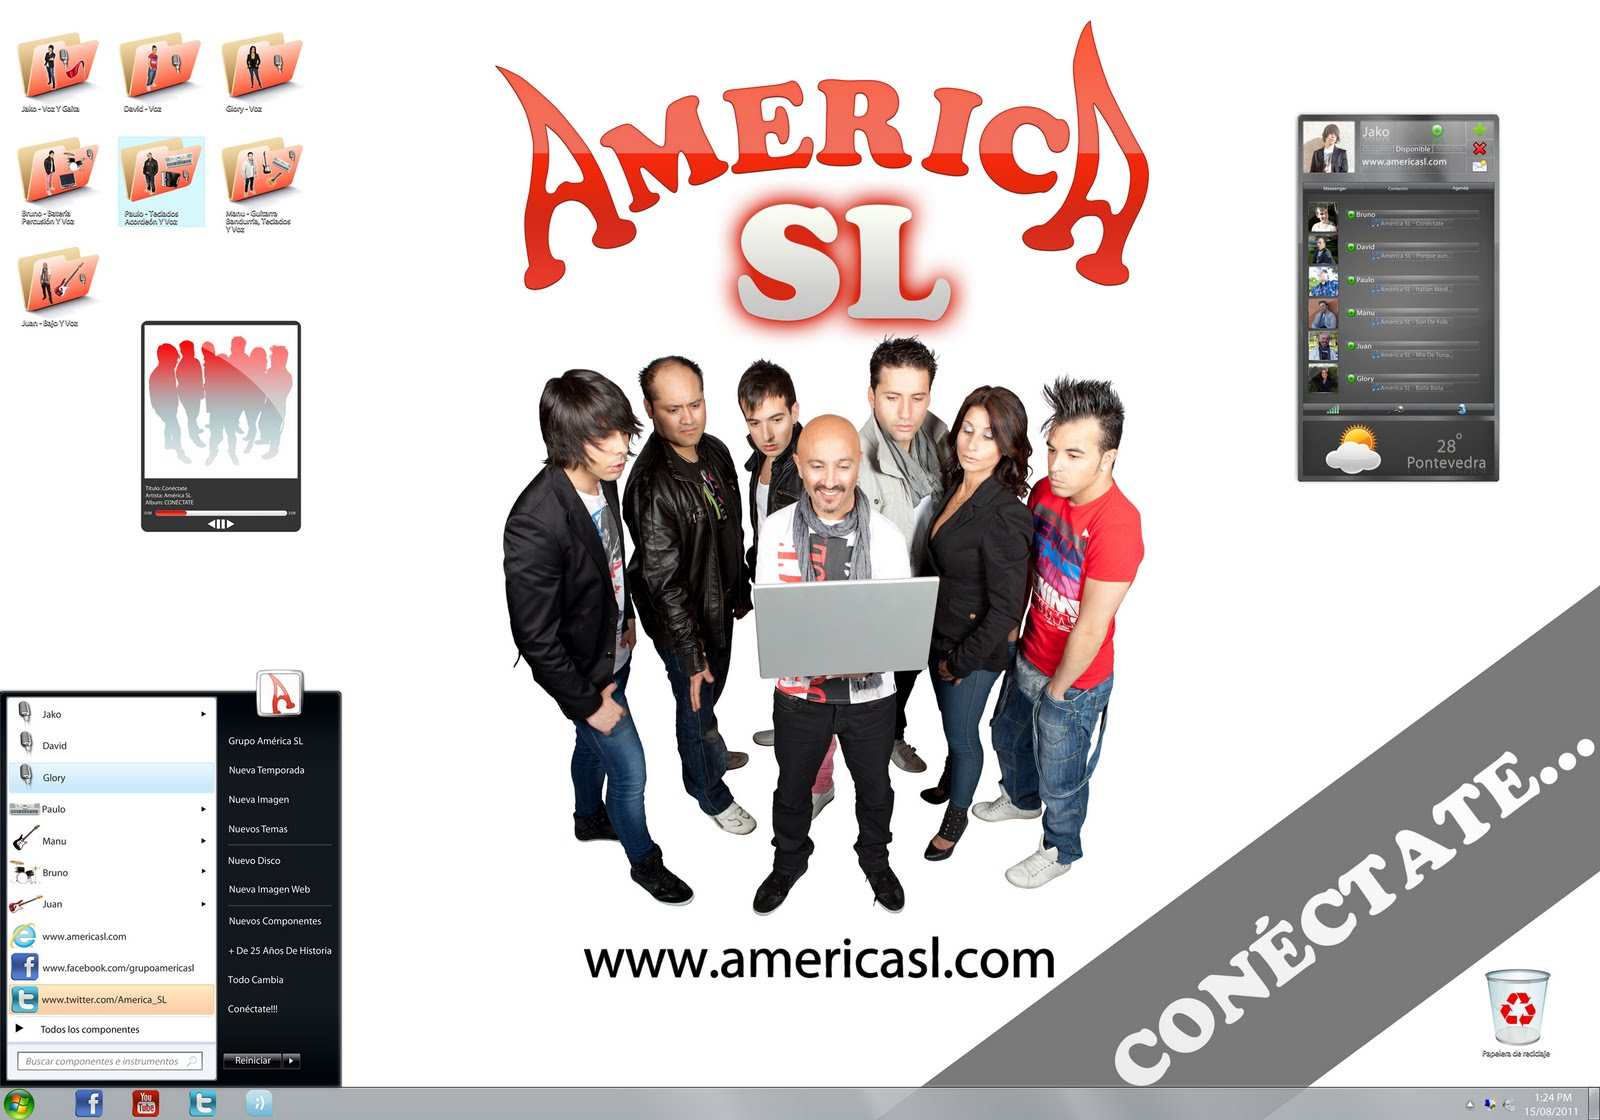 http://2.bp.blogspot.com/-0qxqbEqkEng/TeqvHDrJ9CI/AAAAAAAAi2o/JCbVqxPU430/s1600/Poster_Grupo_America_SL_2011.jpg